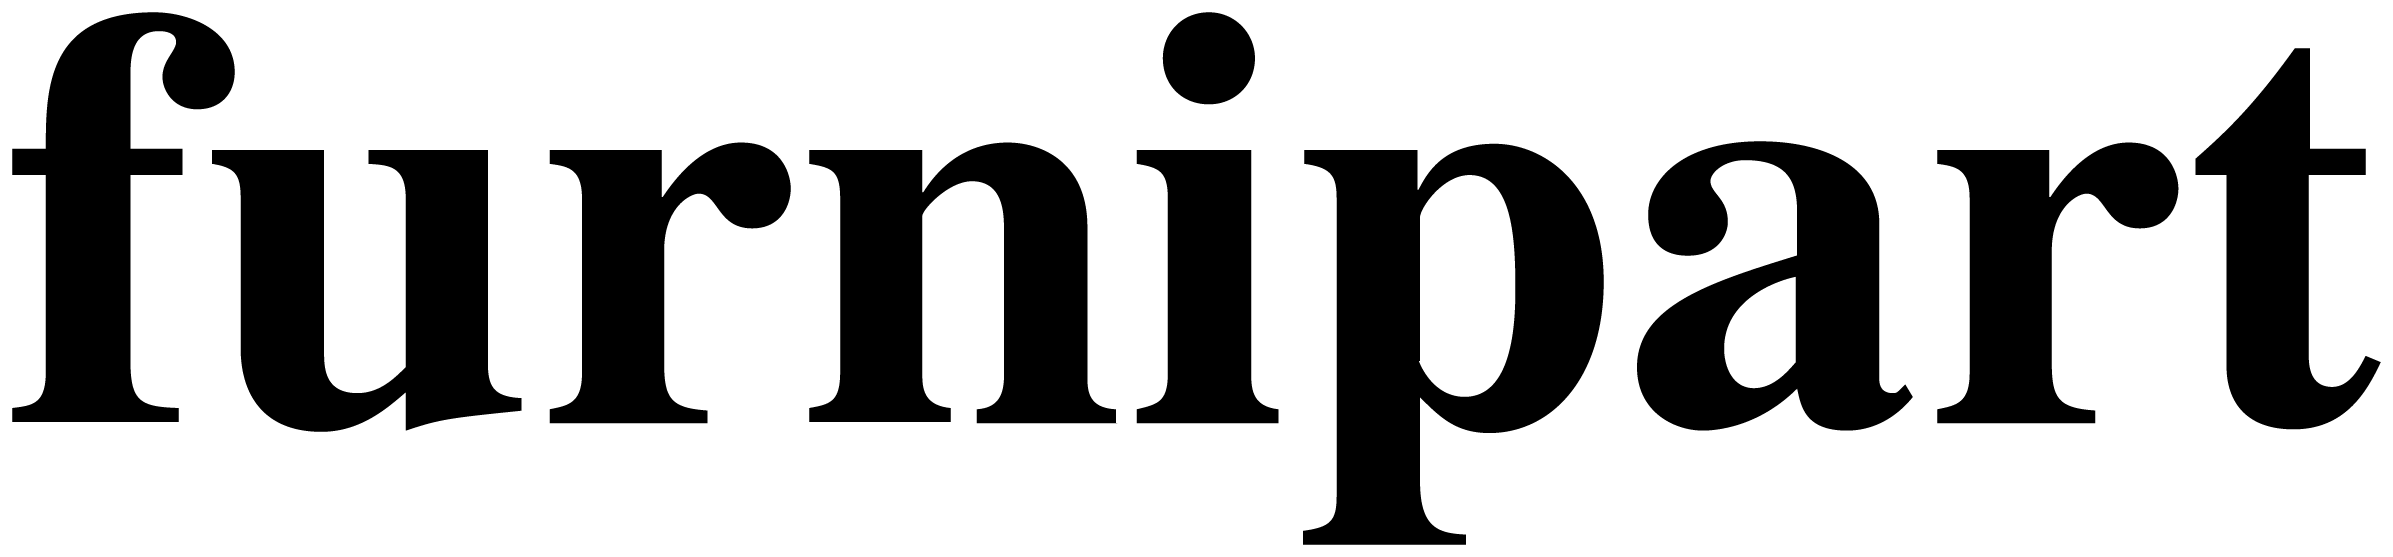 furnipart-logo.png